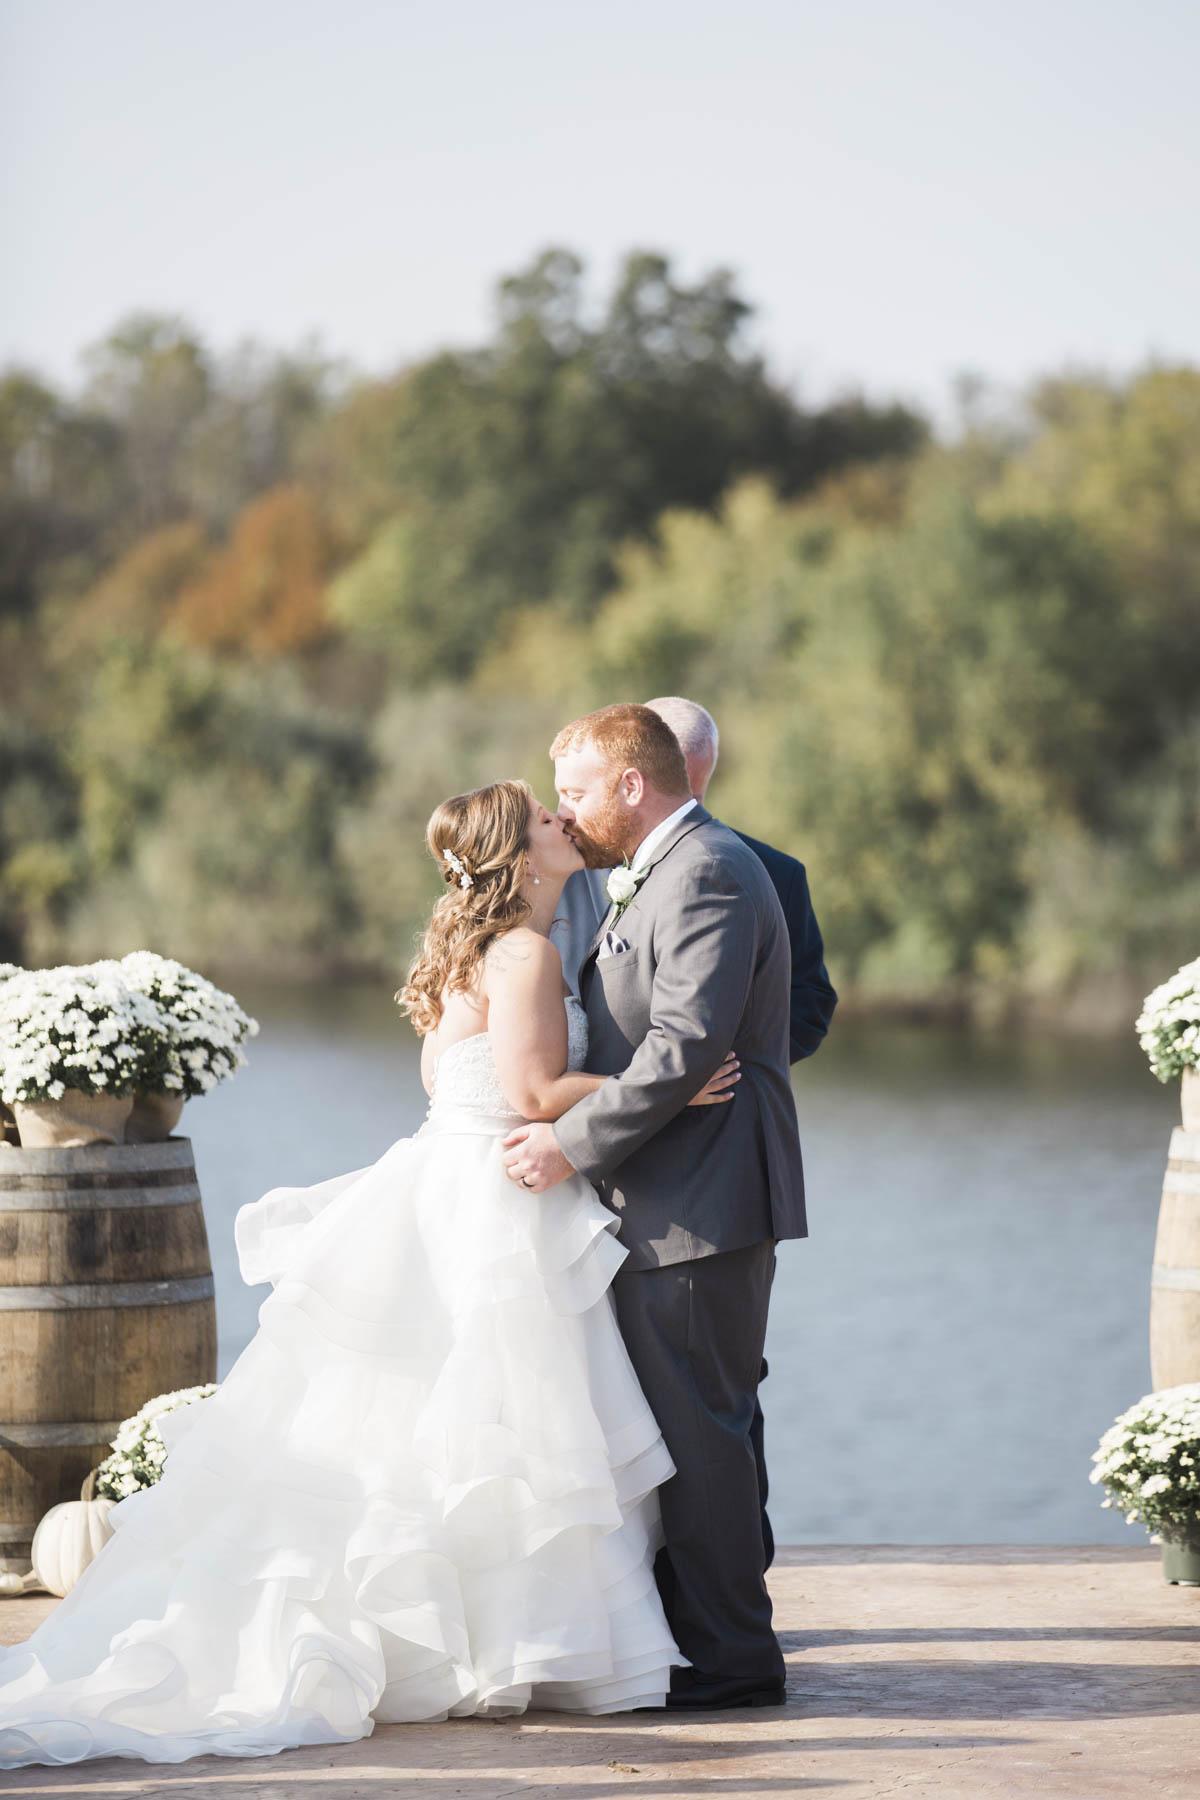 shotbychelsea_blog_wedding-25.jpg